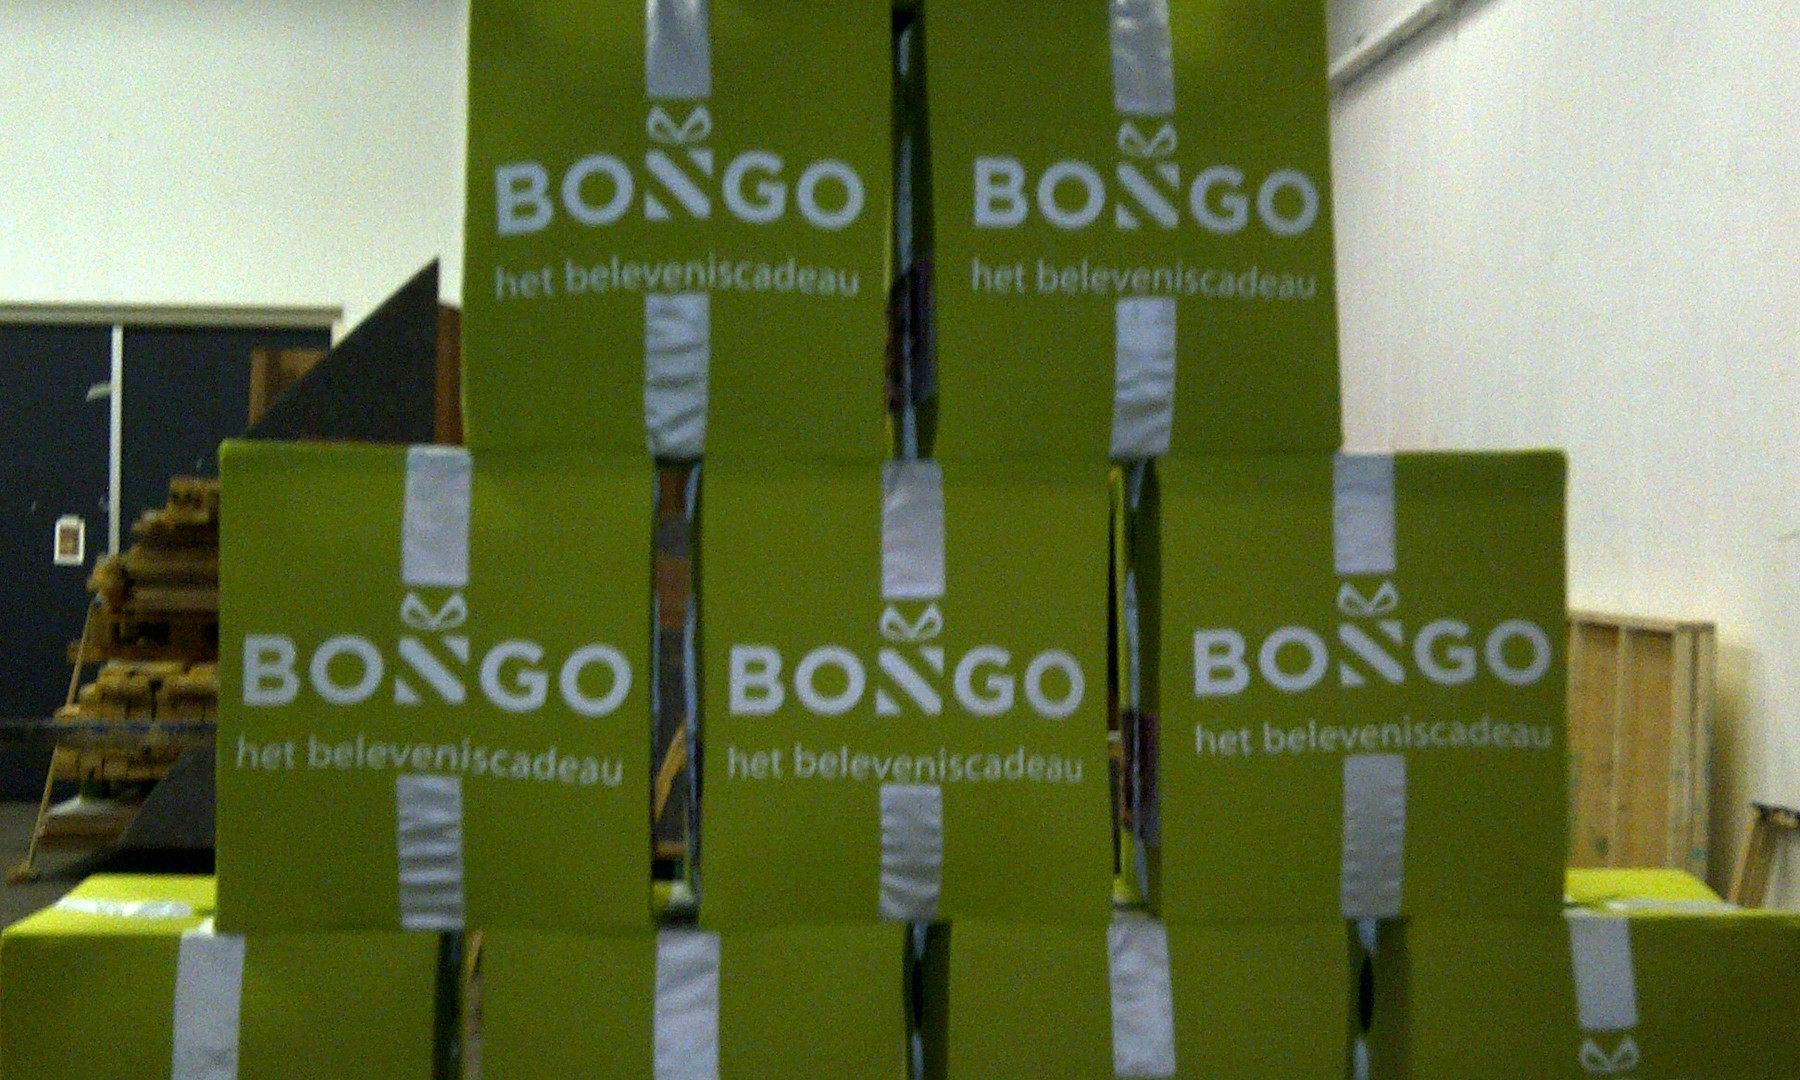 Bongo cadeau x 10